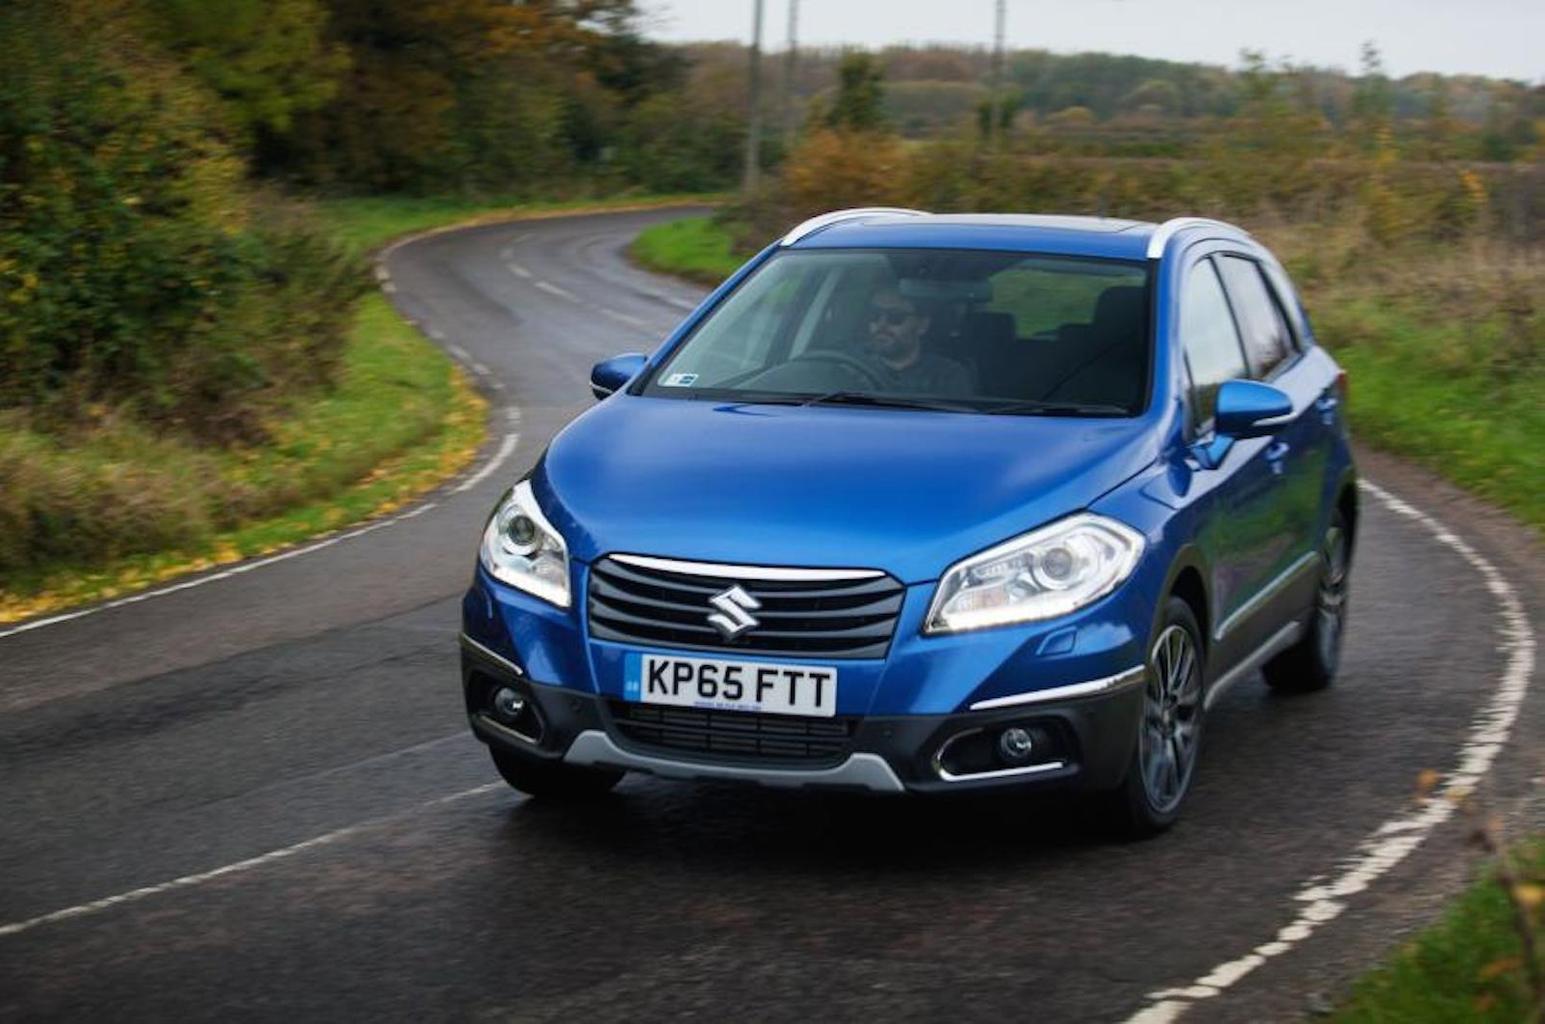 2015 Suzuki SX4 S-Cross 1.6 DDIS ALLGRIP TCSS review